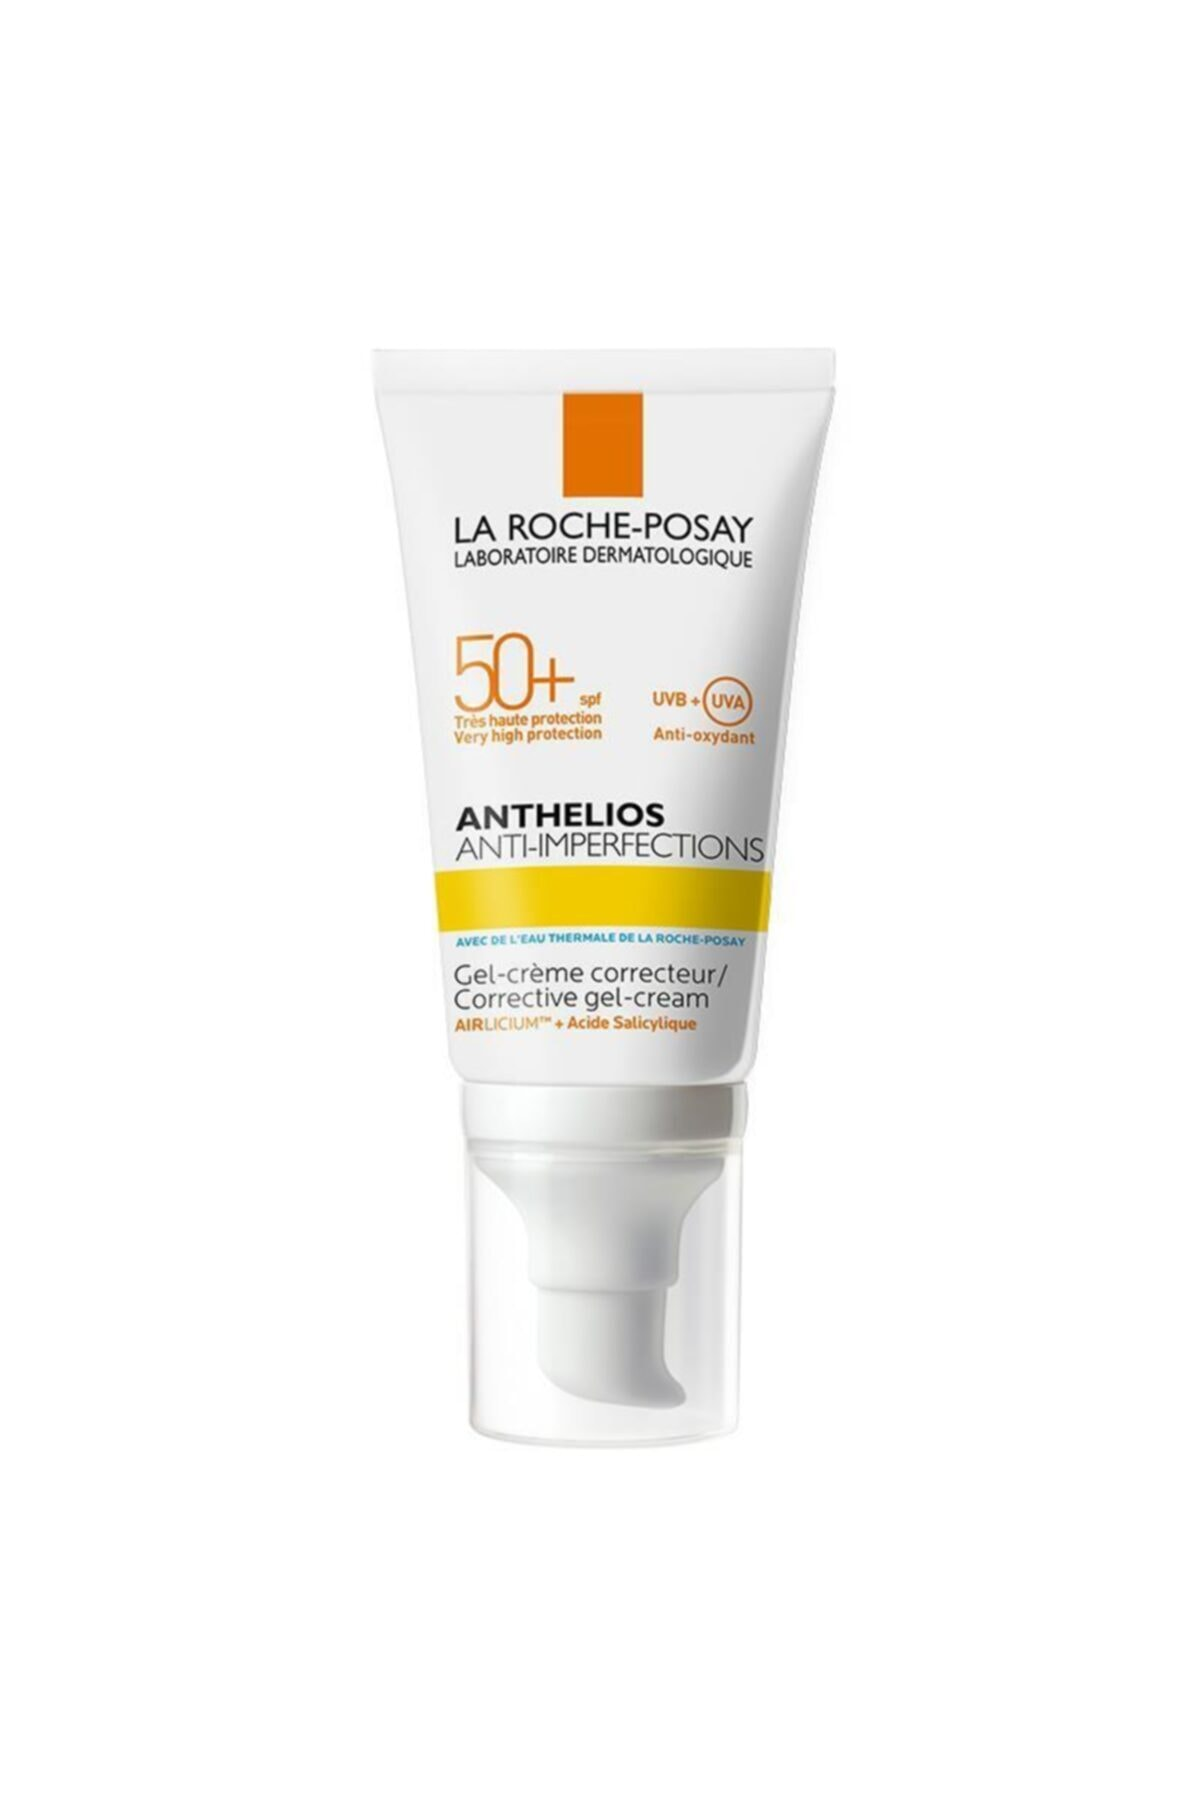 La Roche Posay Anthelios Anti Imperfections Jel Krem Spf 50+ 50 ml 2